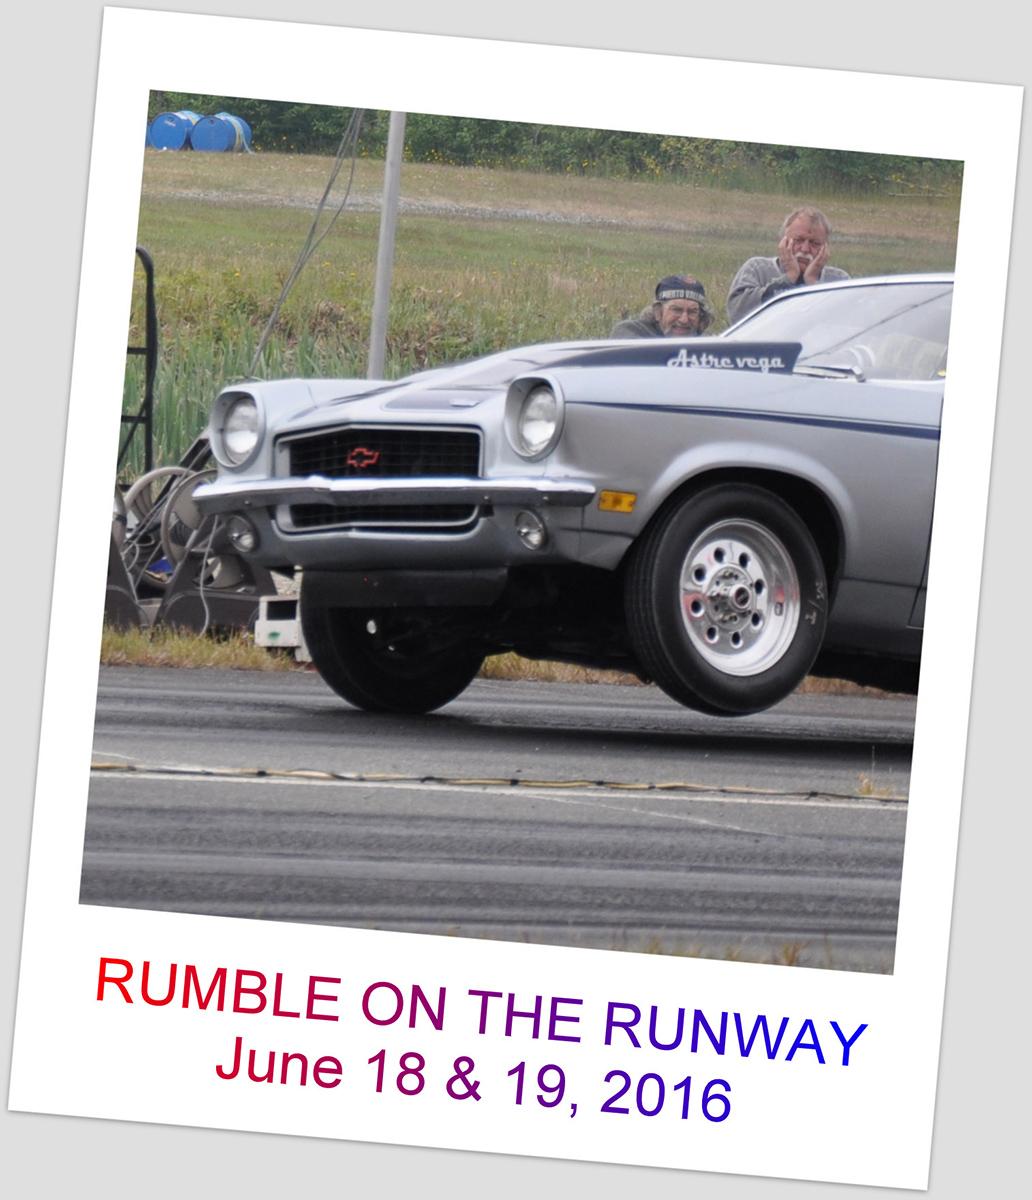 Rumble on the Runway June 18 & 19, 2016 1218